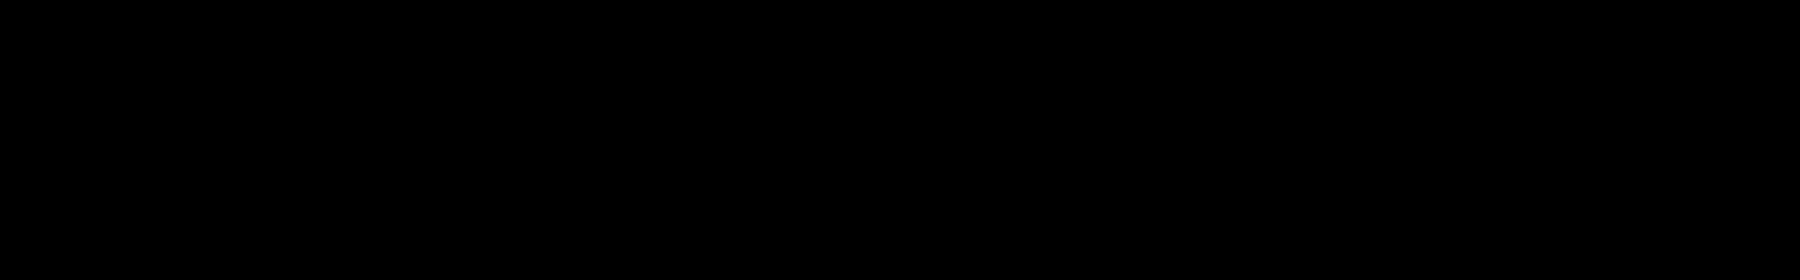 CATALYST audio waveform